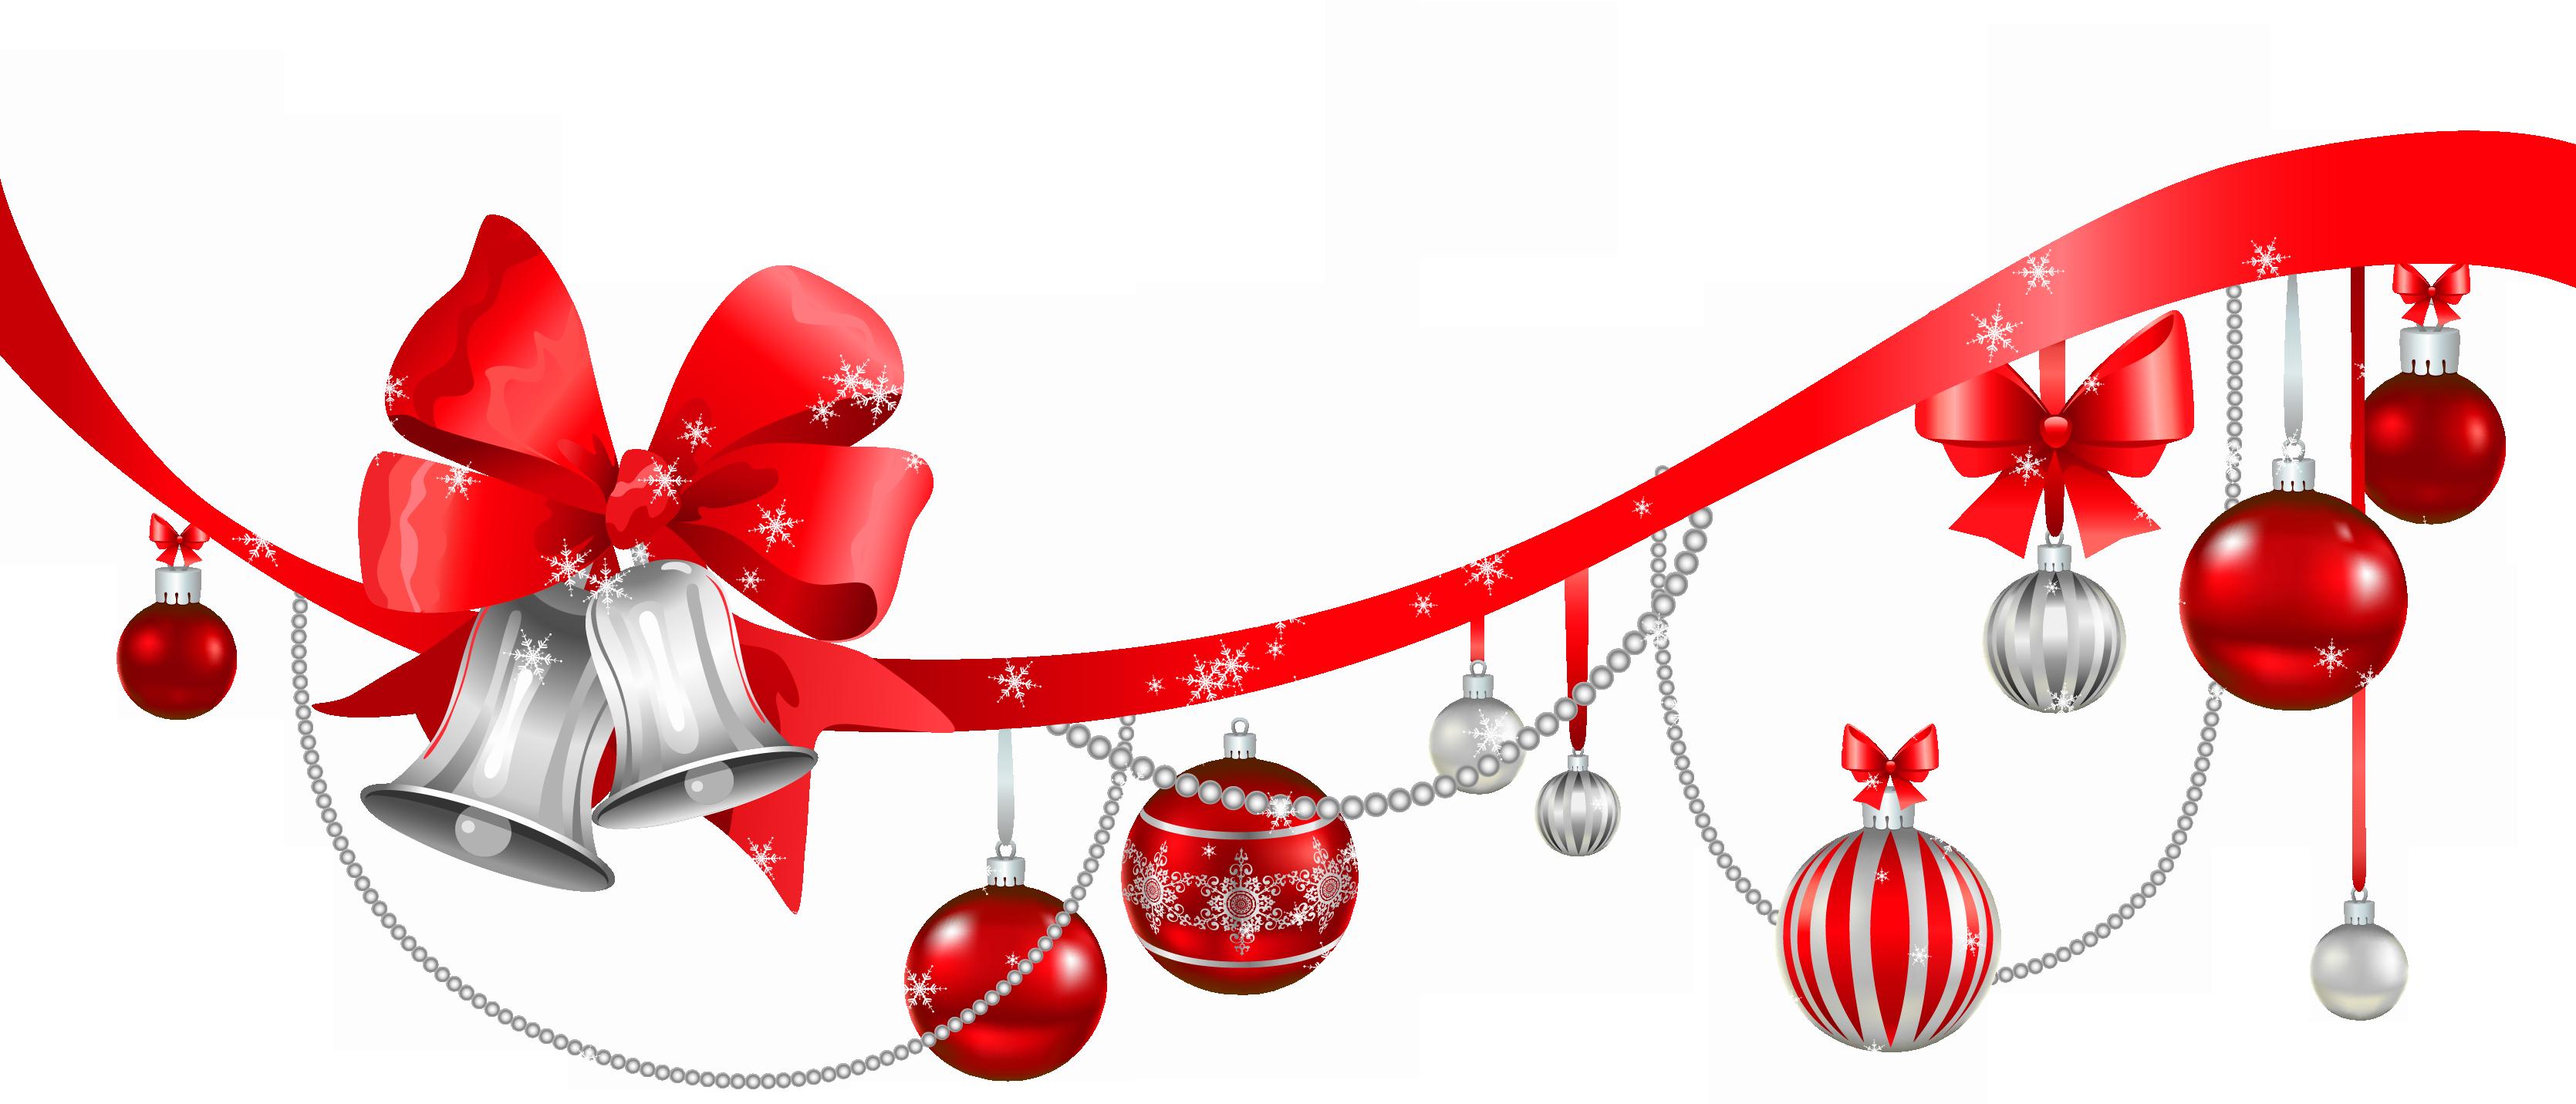 Free christmas decorations .-Free christmas decorations .-11